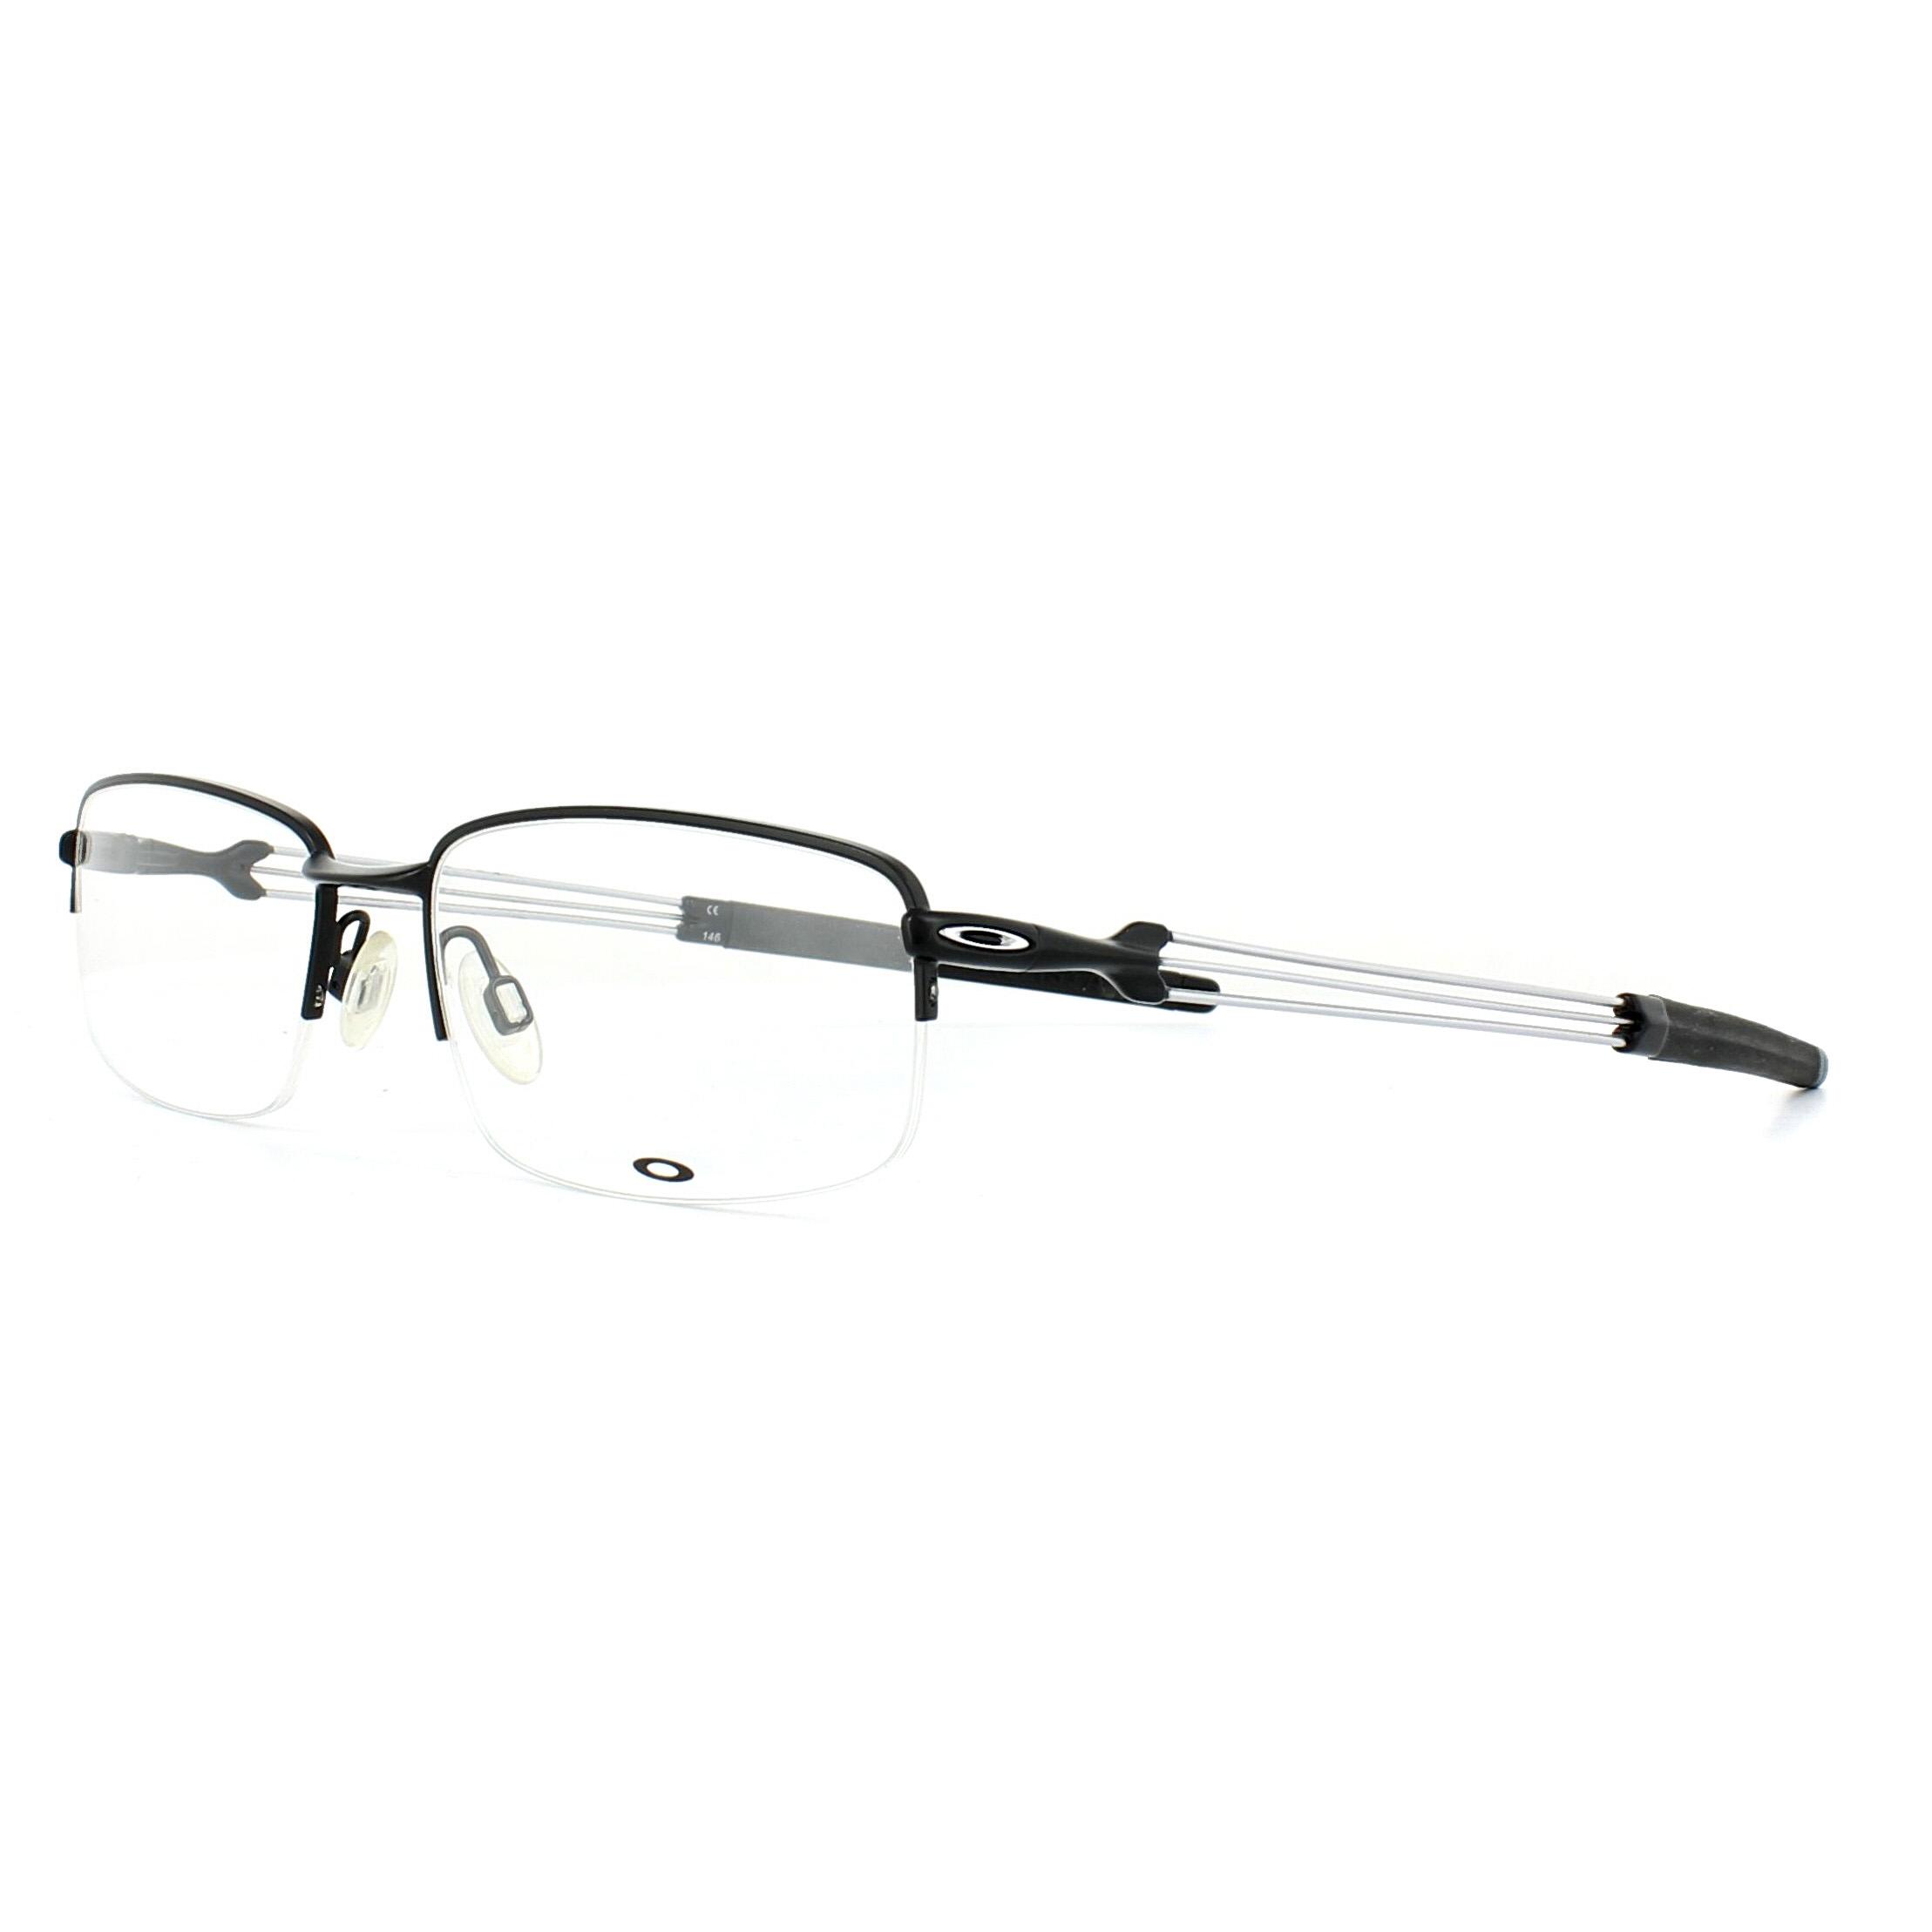 1ced581aea450 Sentinel Oakley Glasses Frames Ballista OX5082-01 Satin Black 55mm Mens